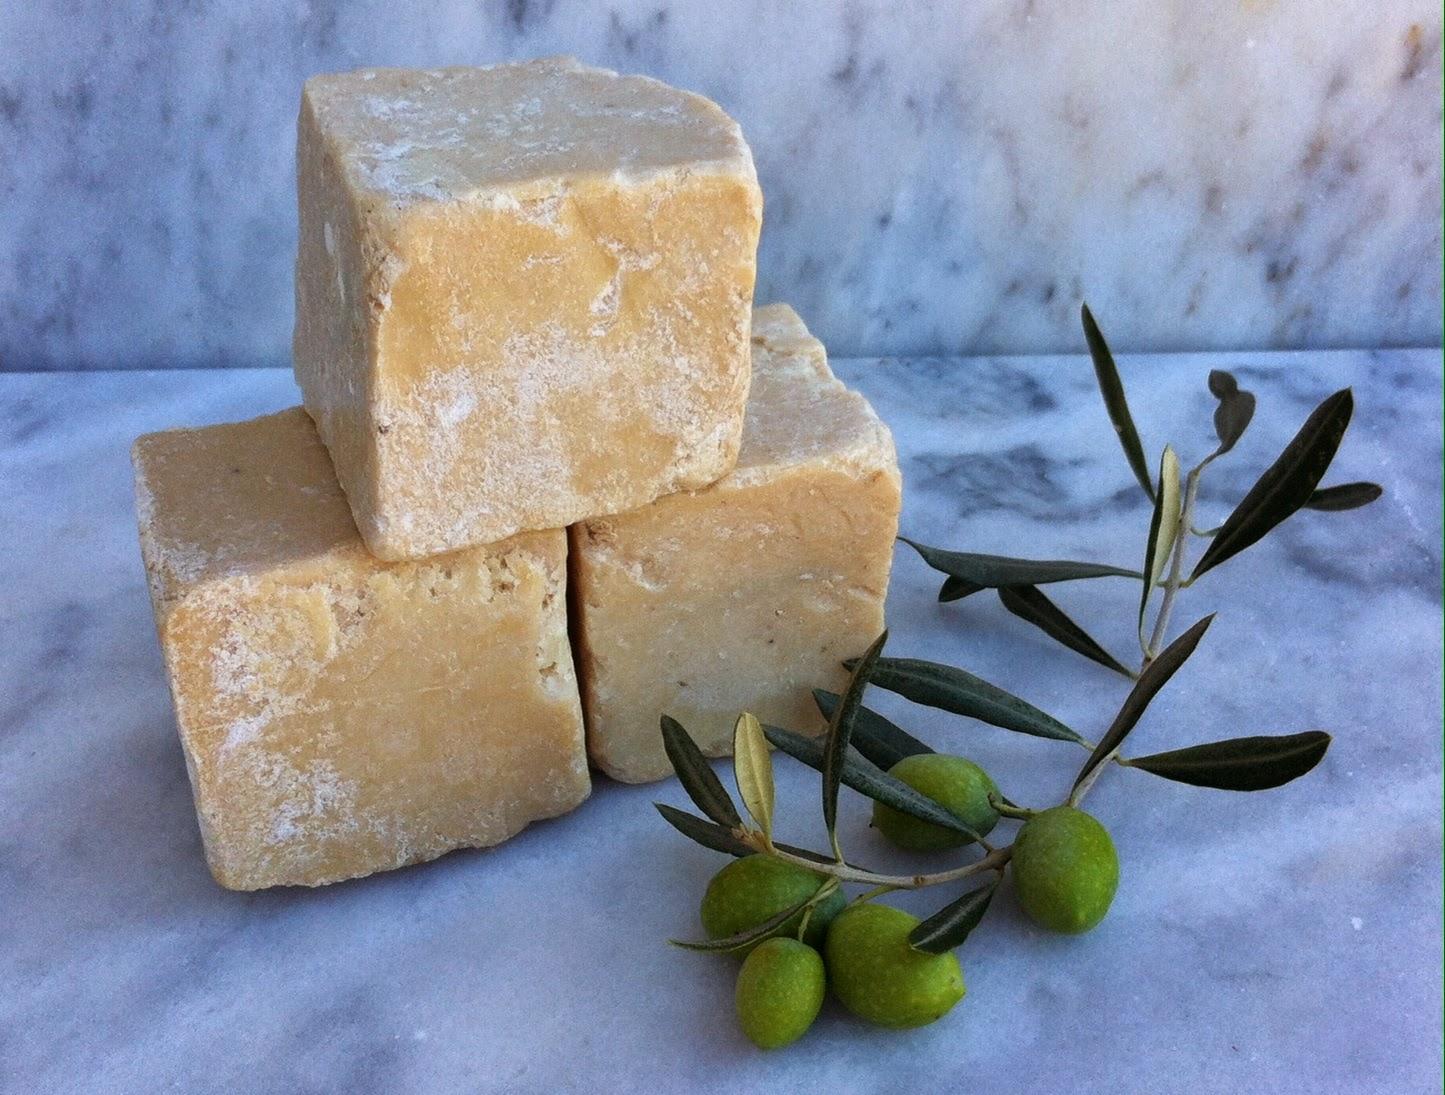 How to make soap without using Lye (Sodium Hydroxide)?